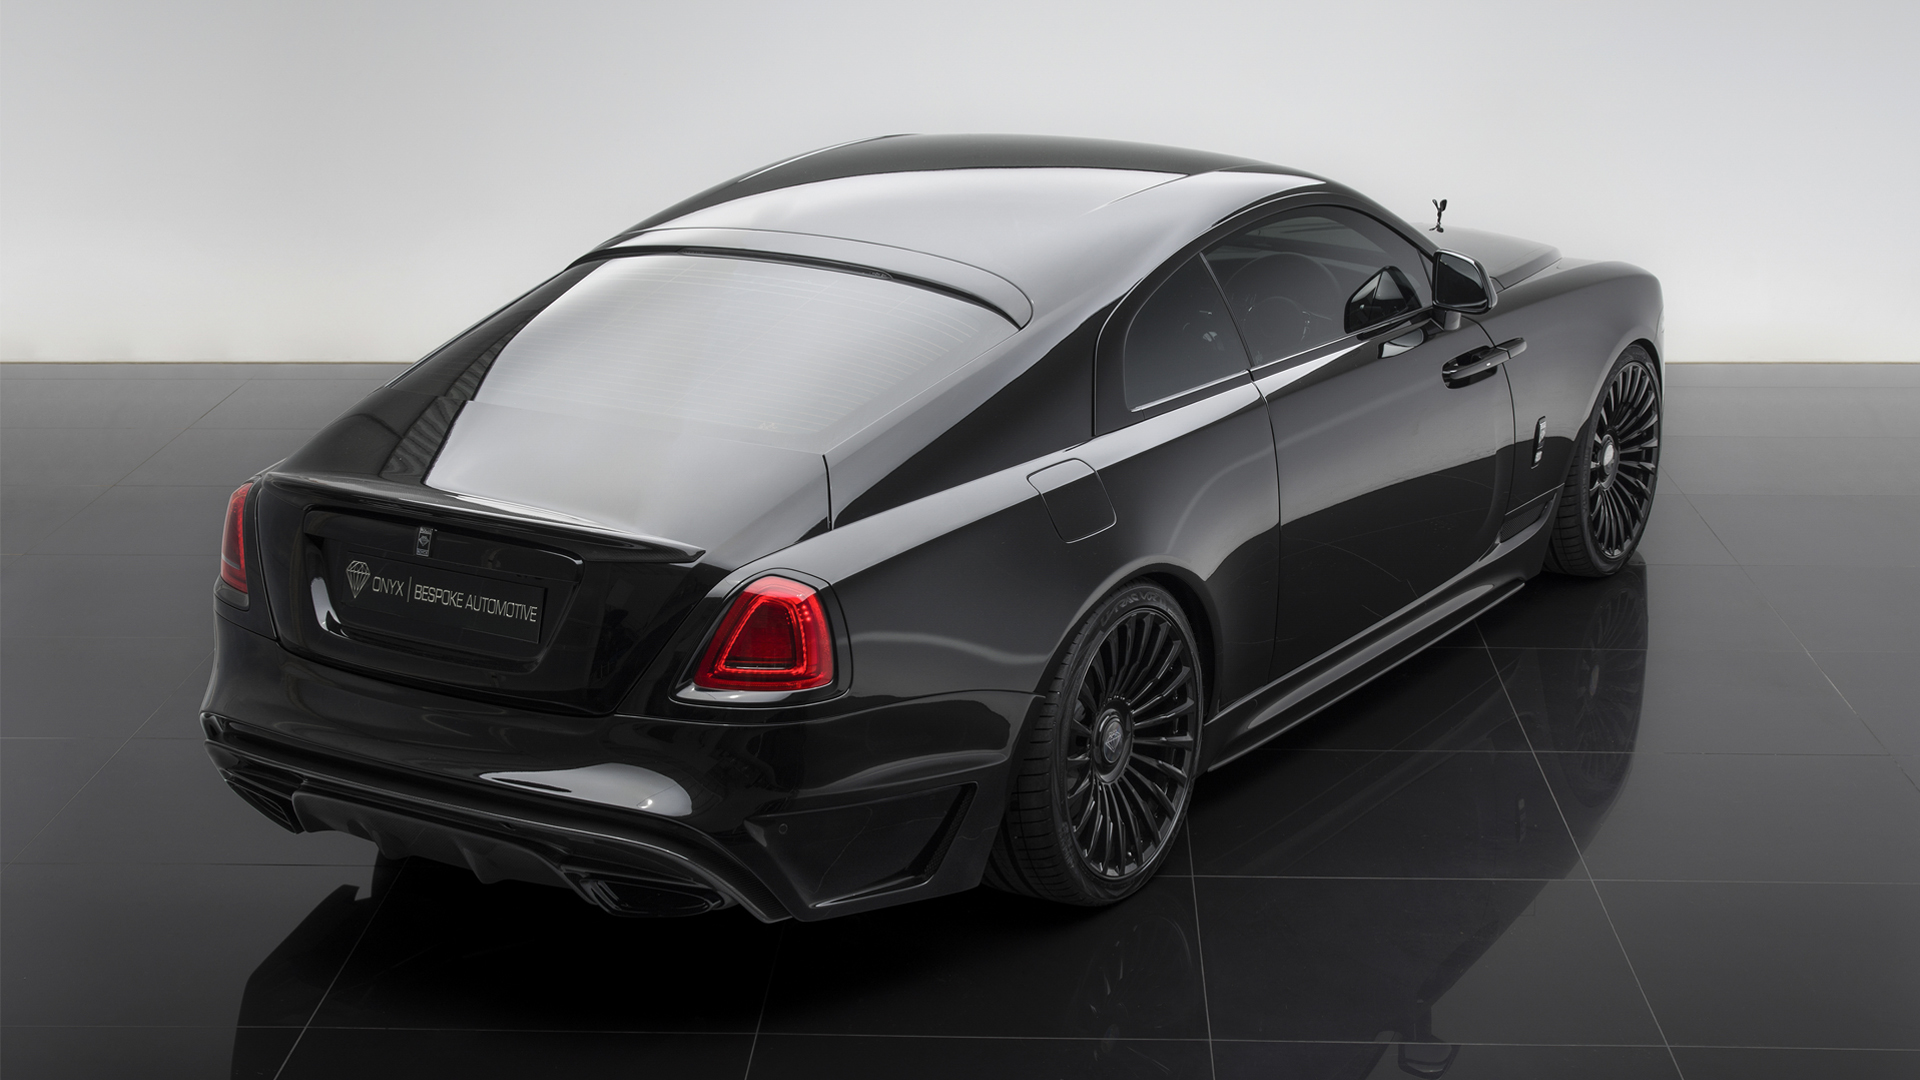 Onyx body kit for ROLLS ROYCE WRAITH new model